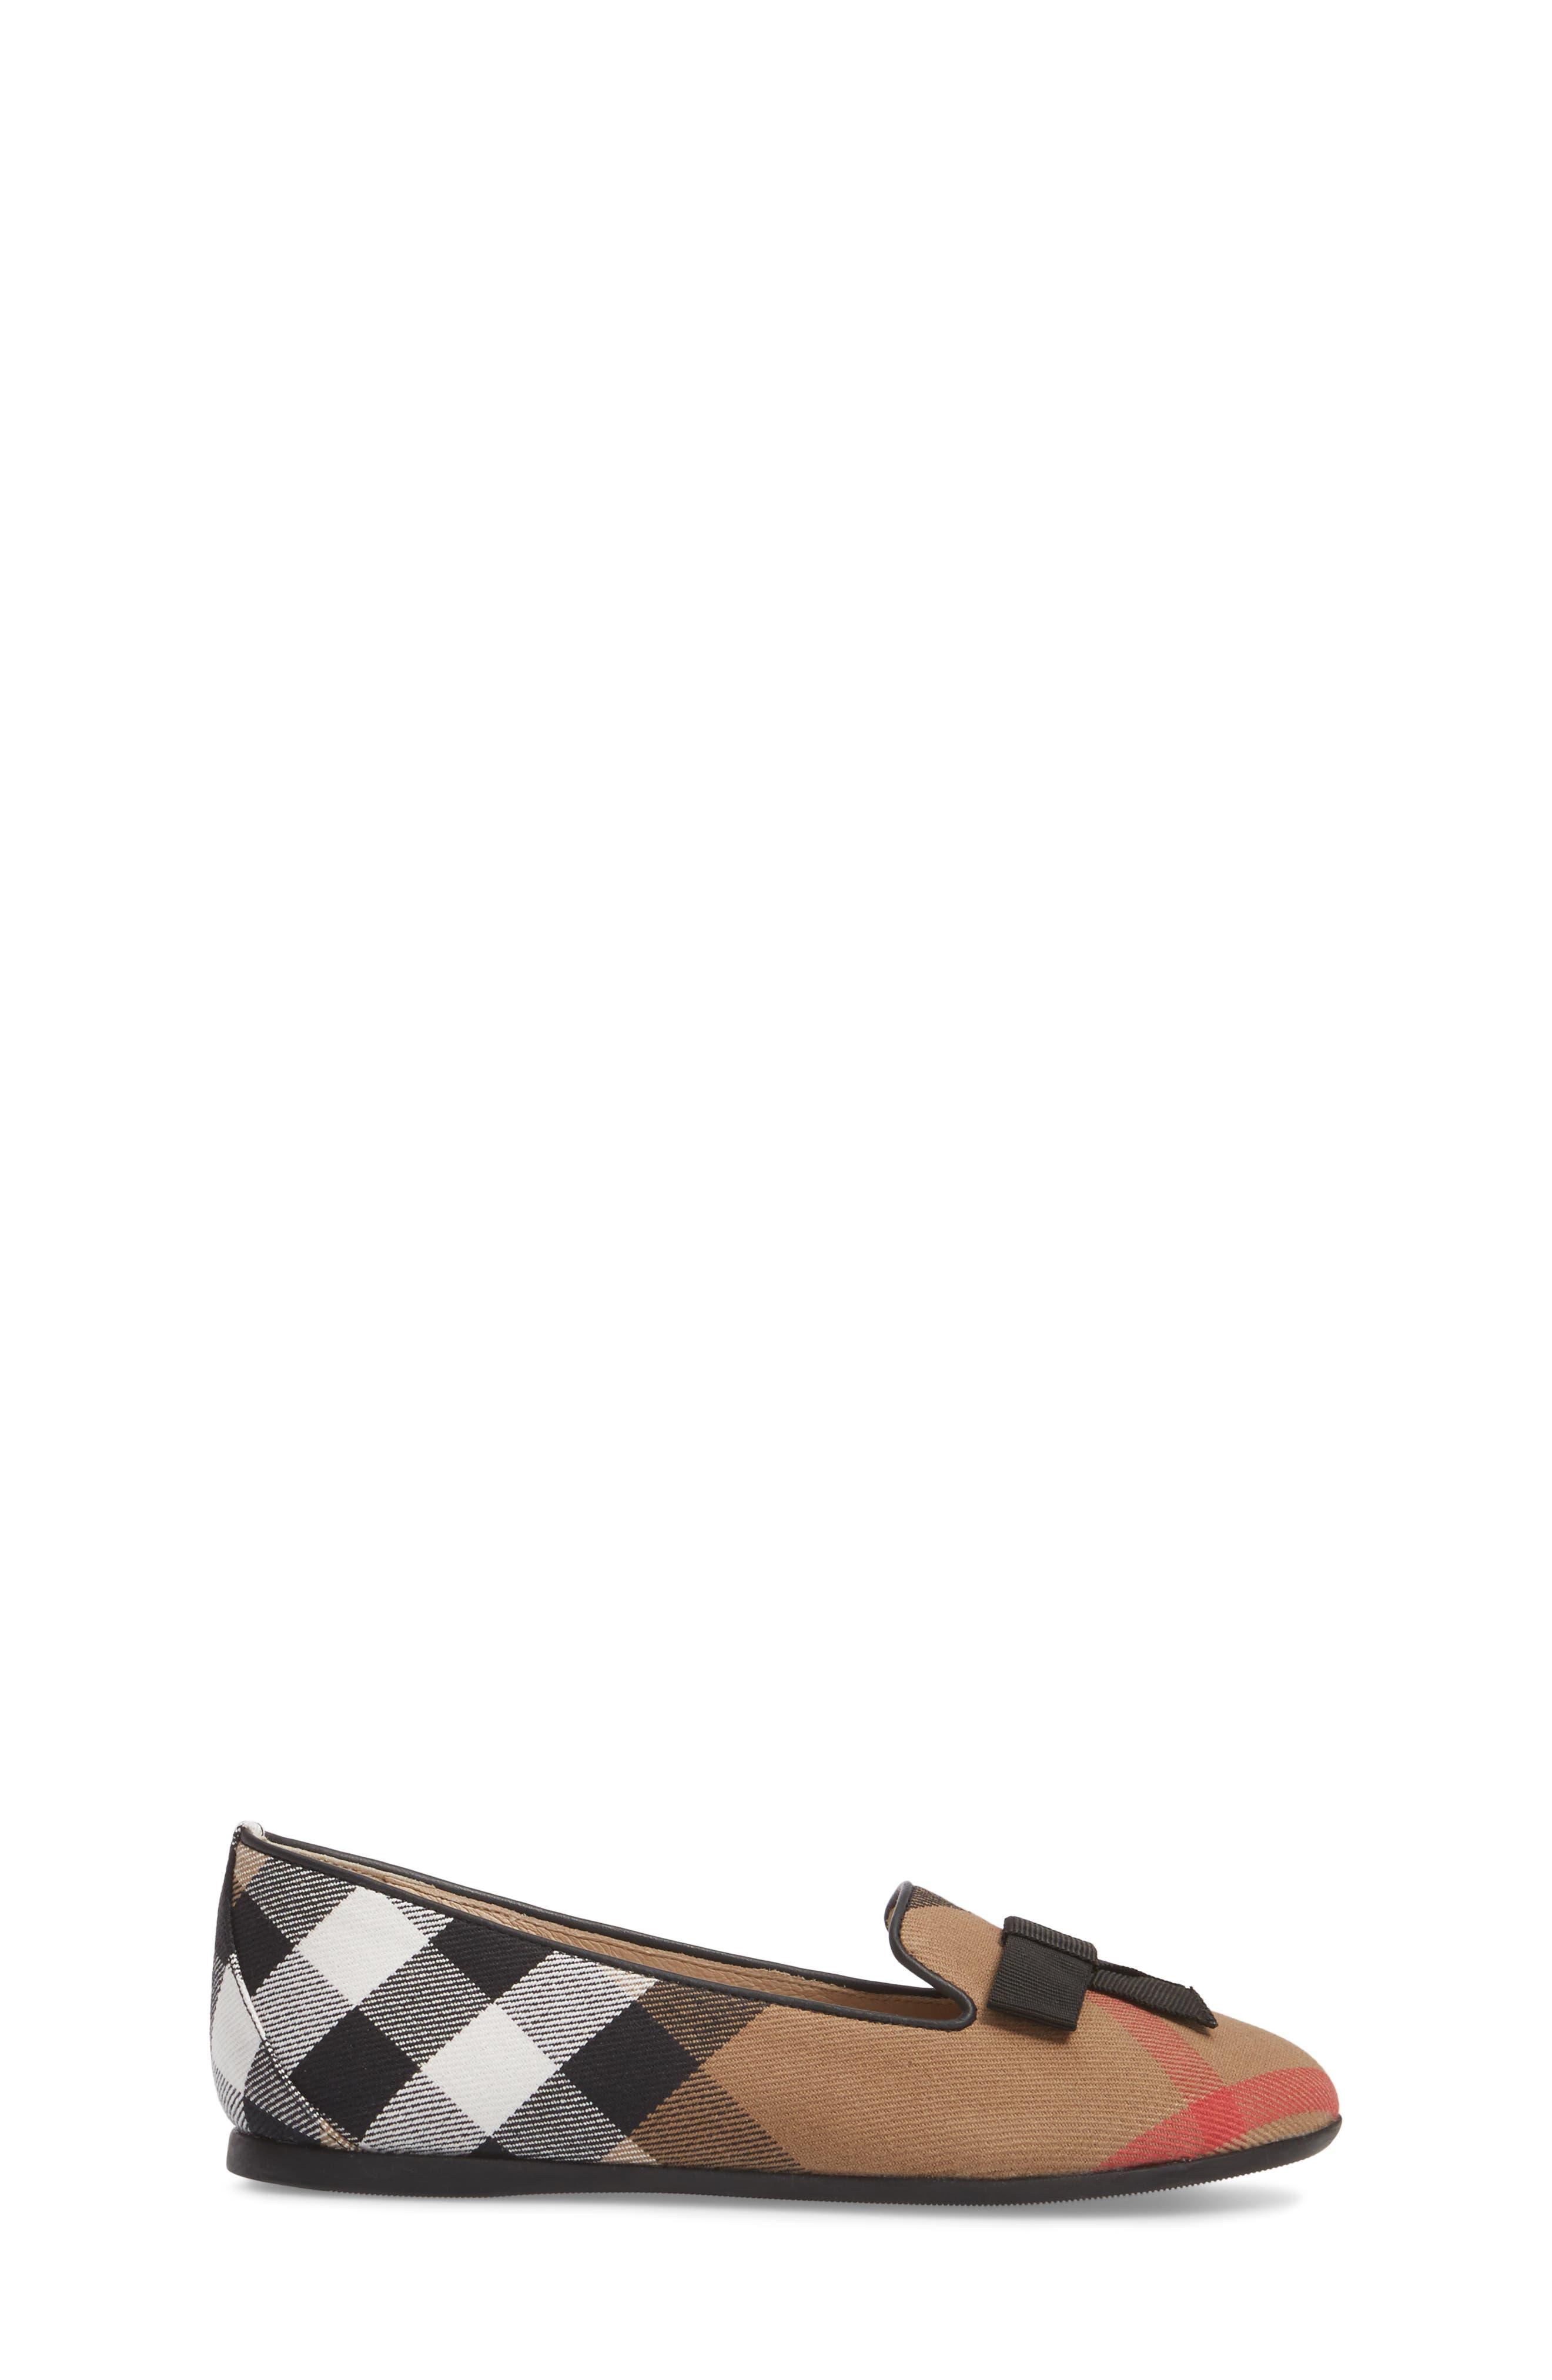 Alternate Image 3  - Burberry Ally Bow Loafer Flat (Walker, Toddler & Little Kid)